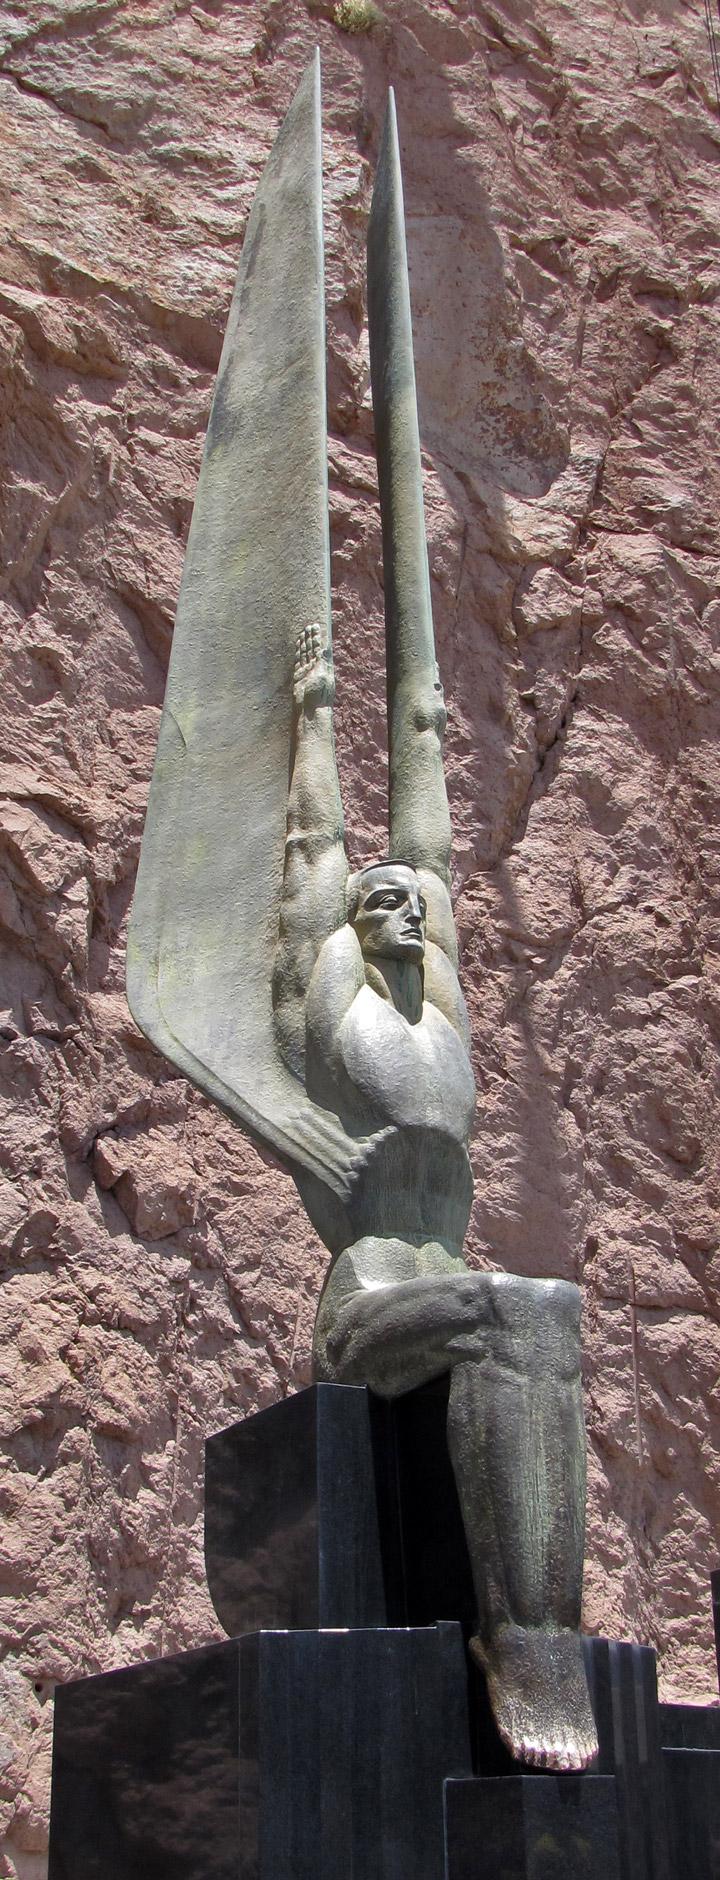 Power Plant At Hoover Dam Nevada Arizona Border Travel Photos Diagram Memorials